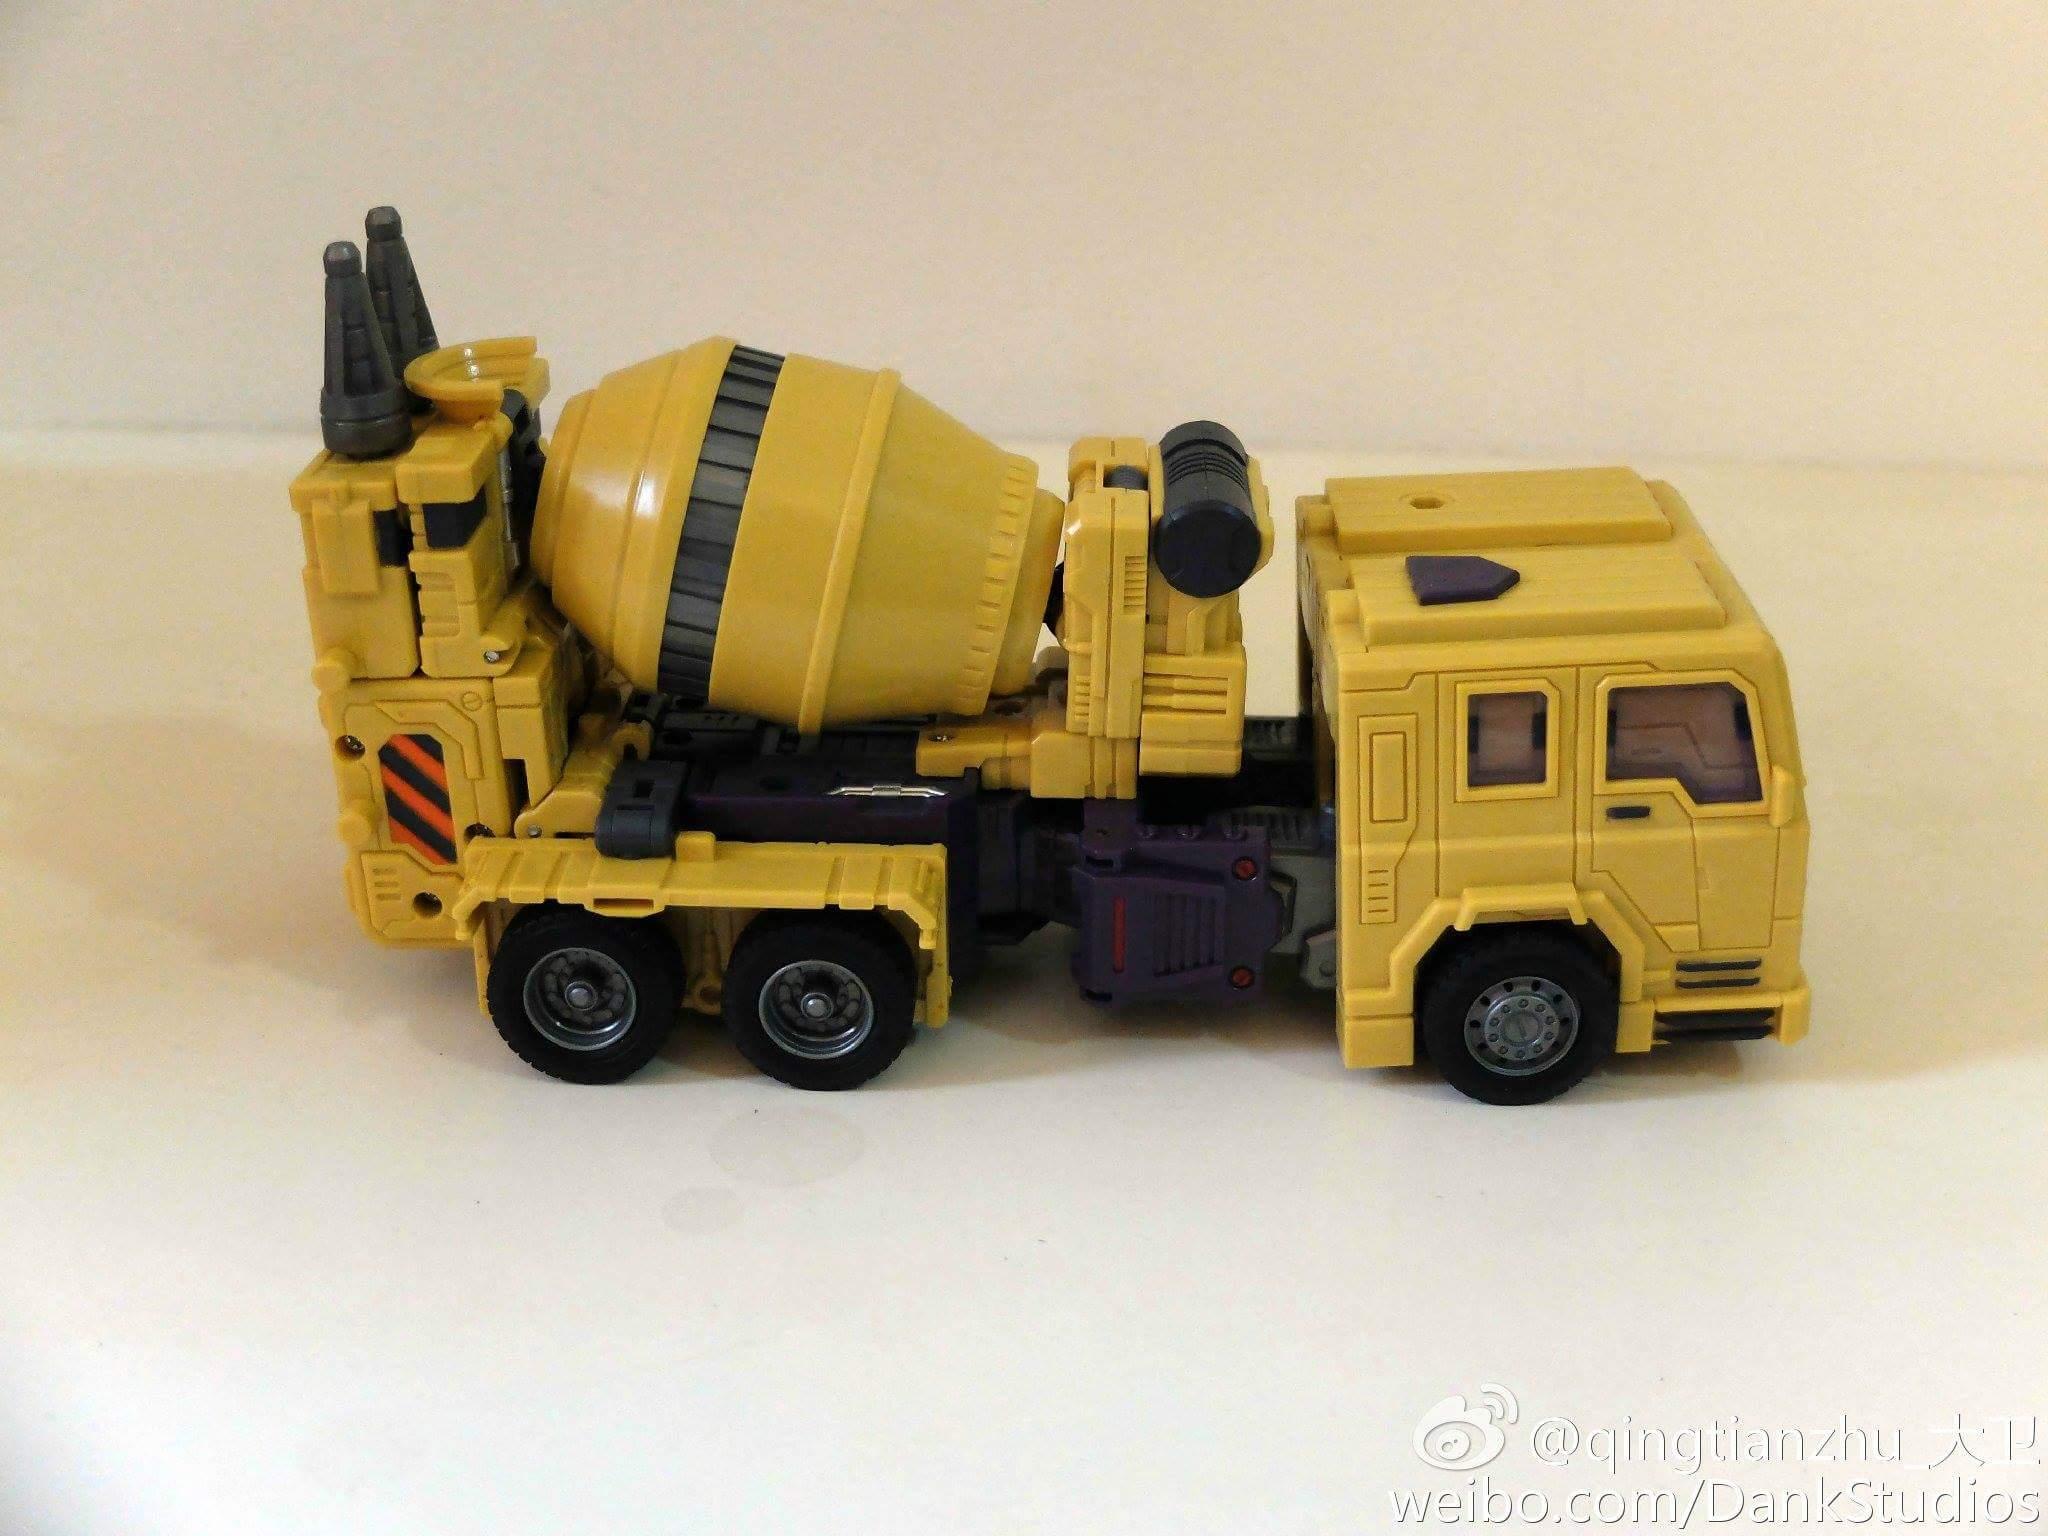 [Toyworld] Produit Tiers - Jouet TW-C Constructor aka Devastator/Dévastateur (Version vert G1 et jaune G2) - Page 8 Fitewcc5